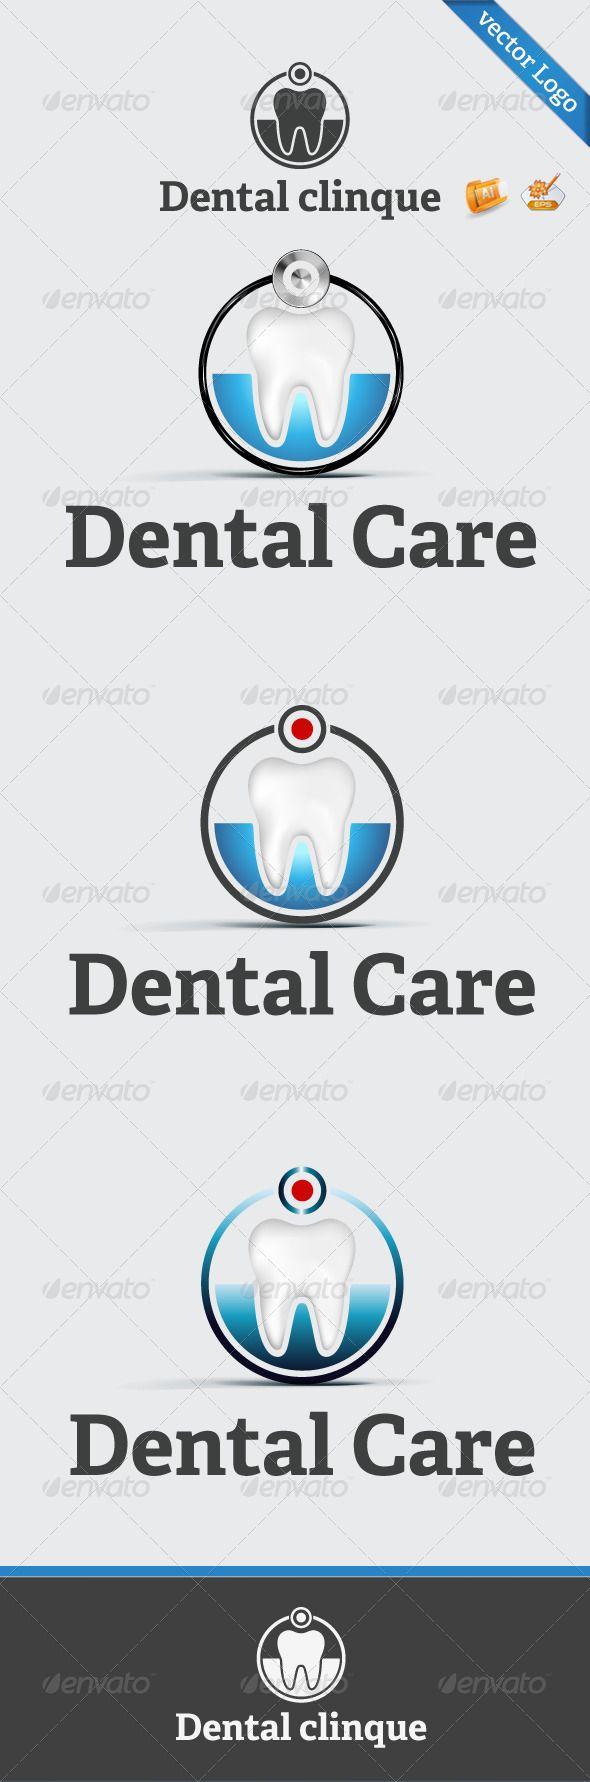 Dental Clinique Logo Template